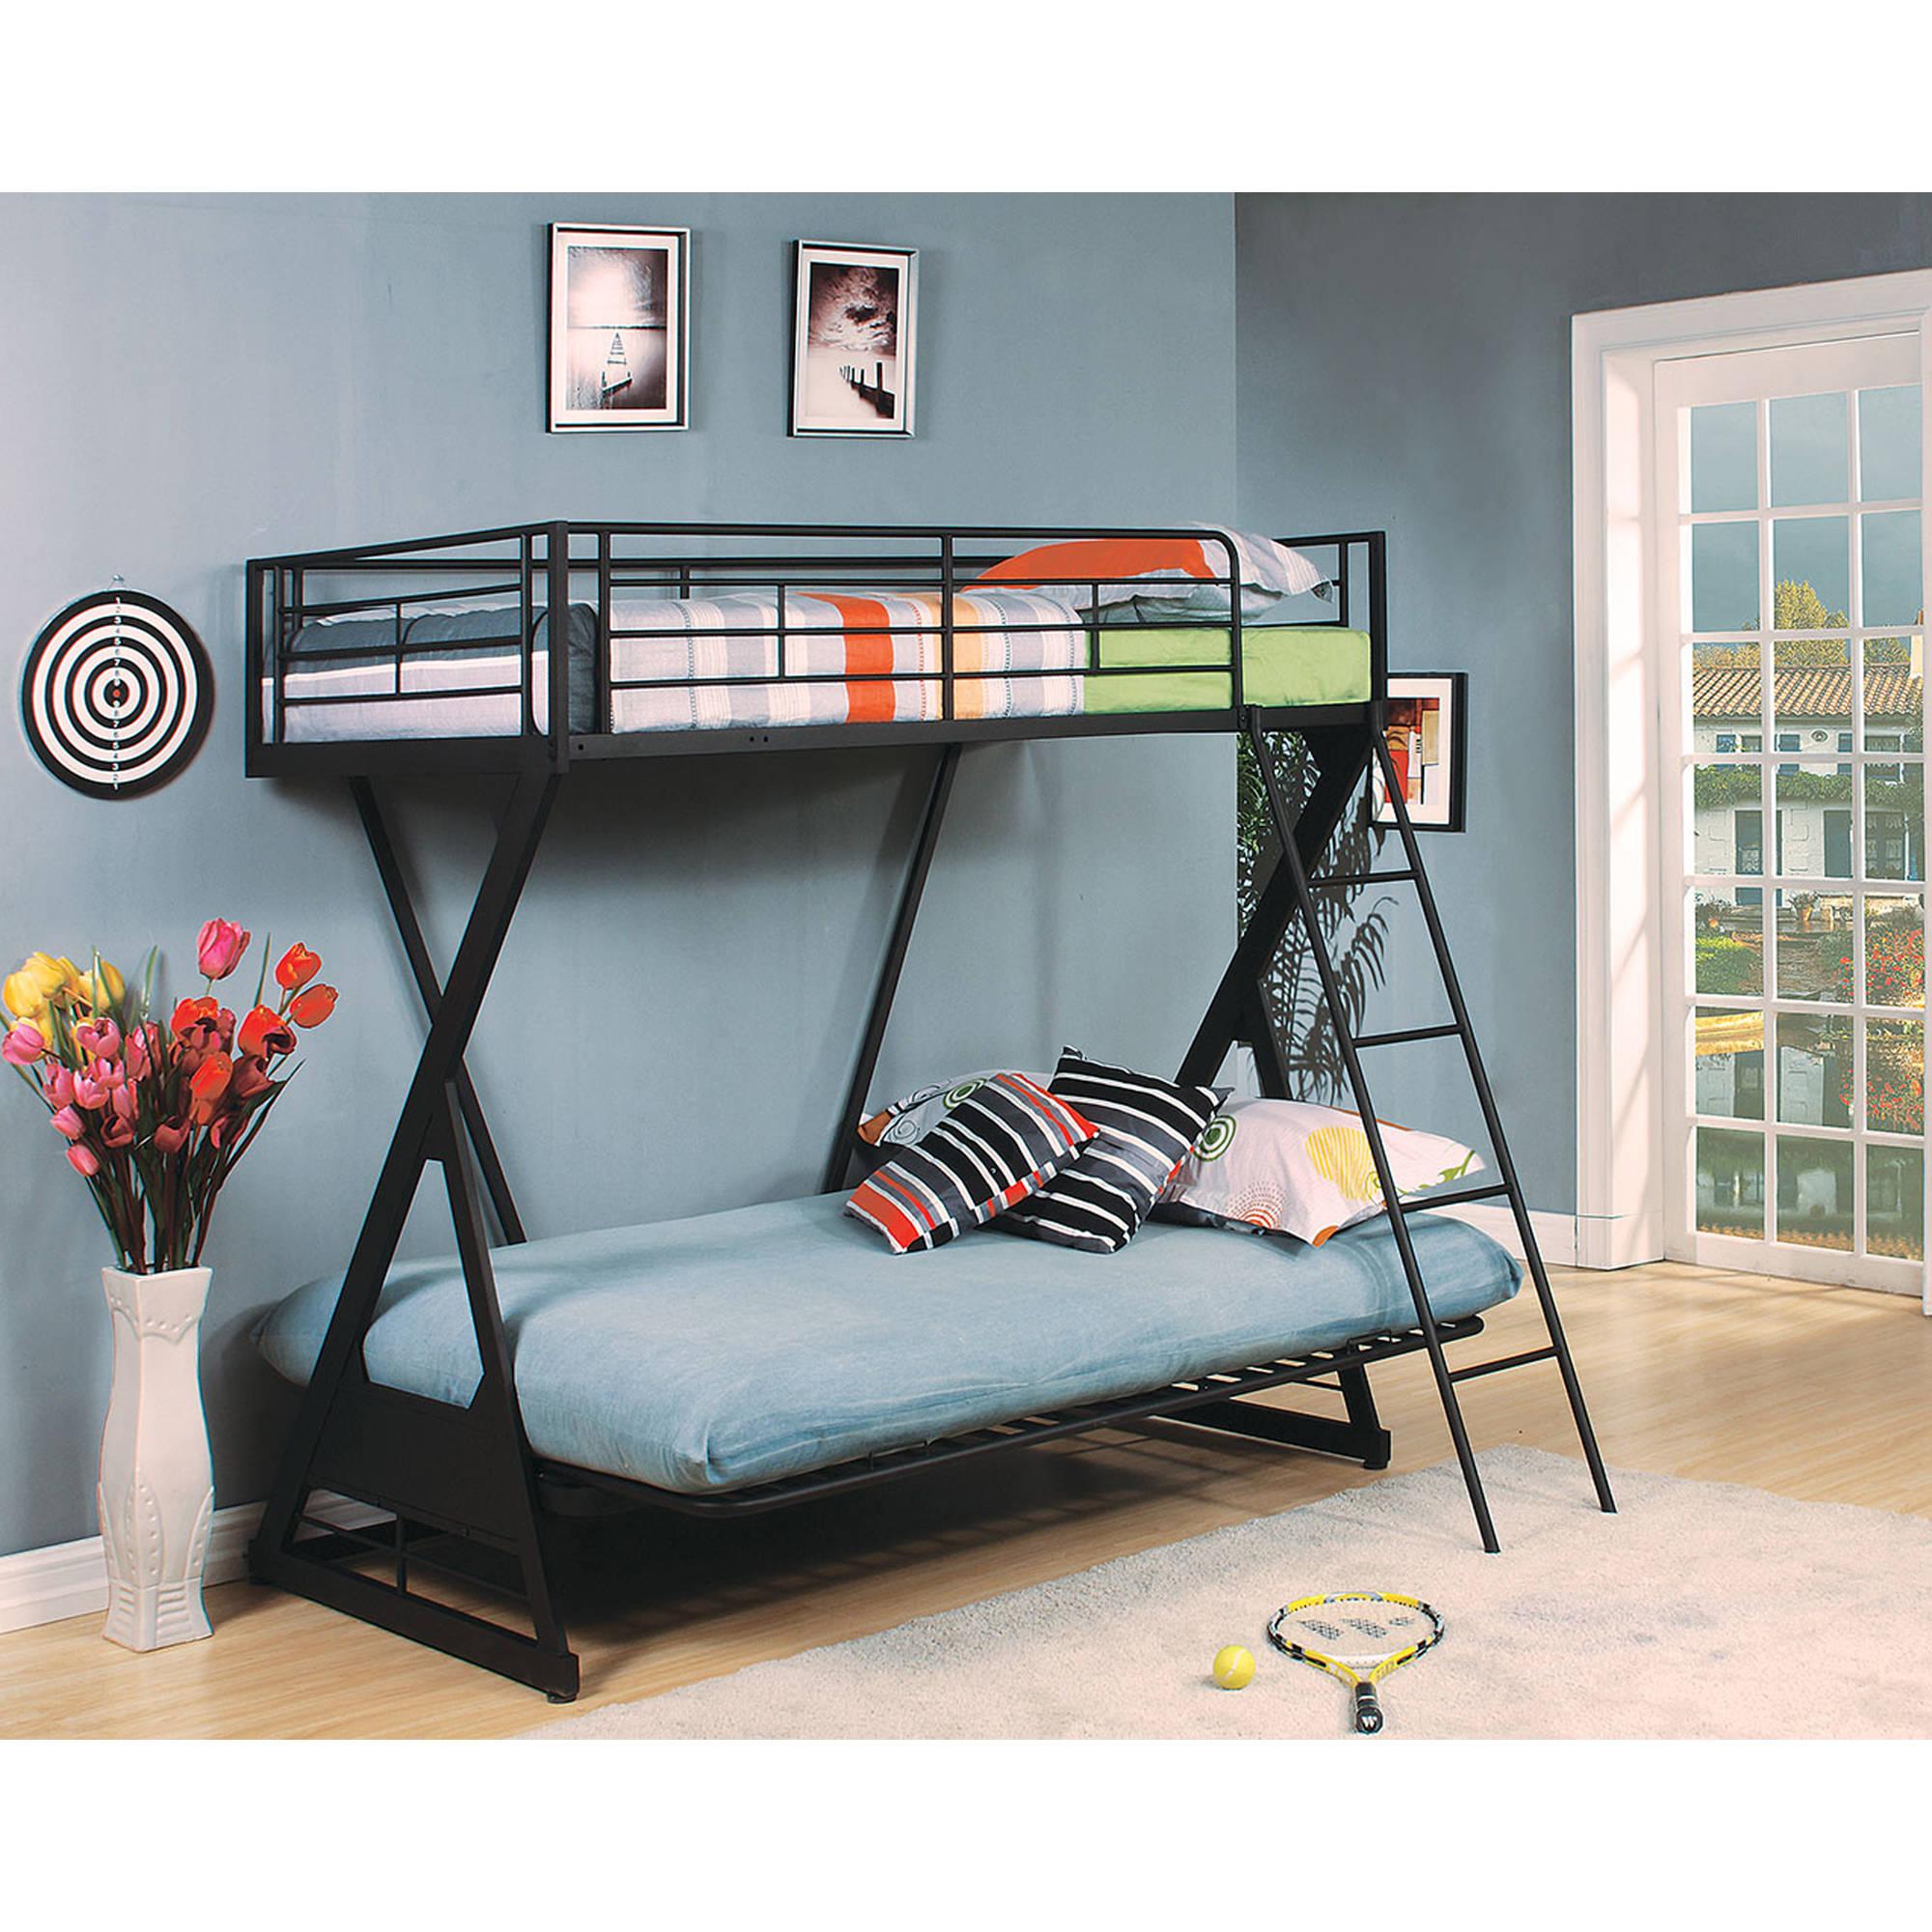 Zazie Twin Over Full Futon Metal Bunk Bed, Sandy Black